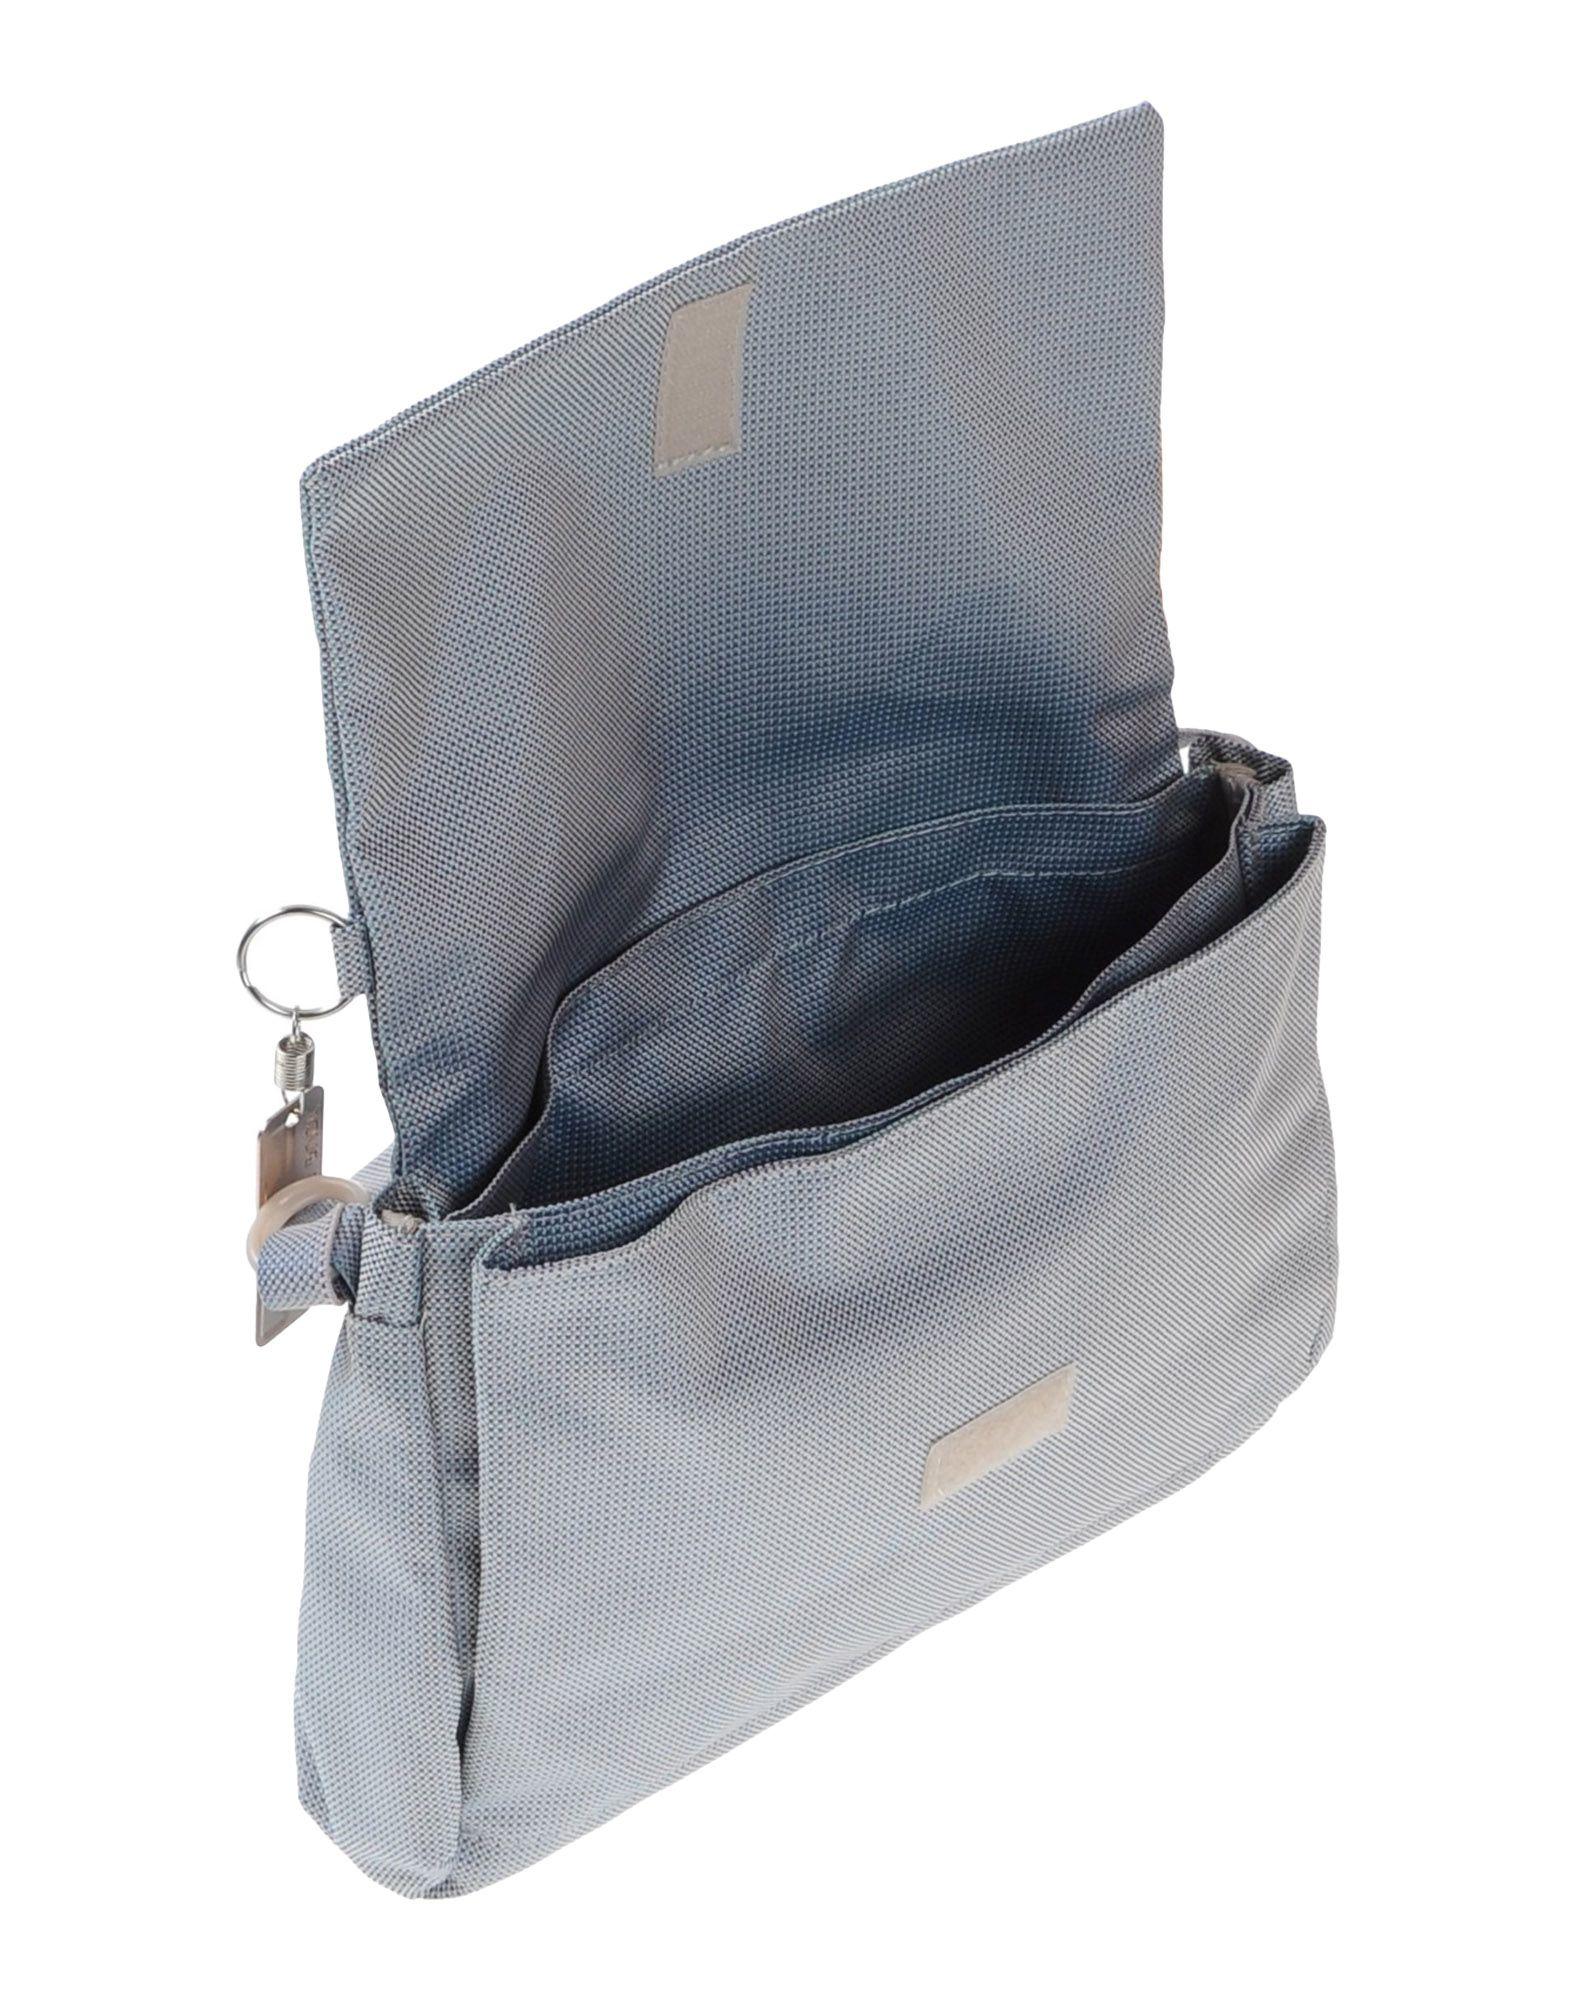 Mandarina Duck Cross-body Bag in Mauve (Purple)